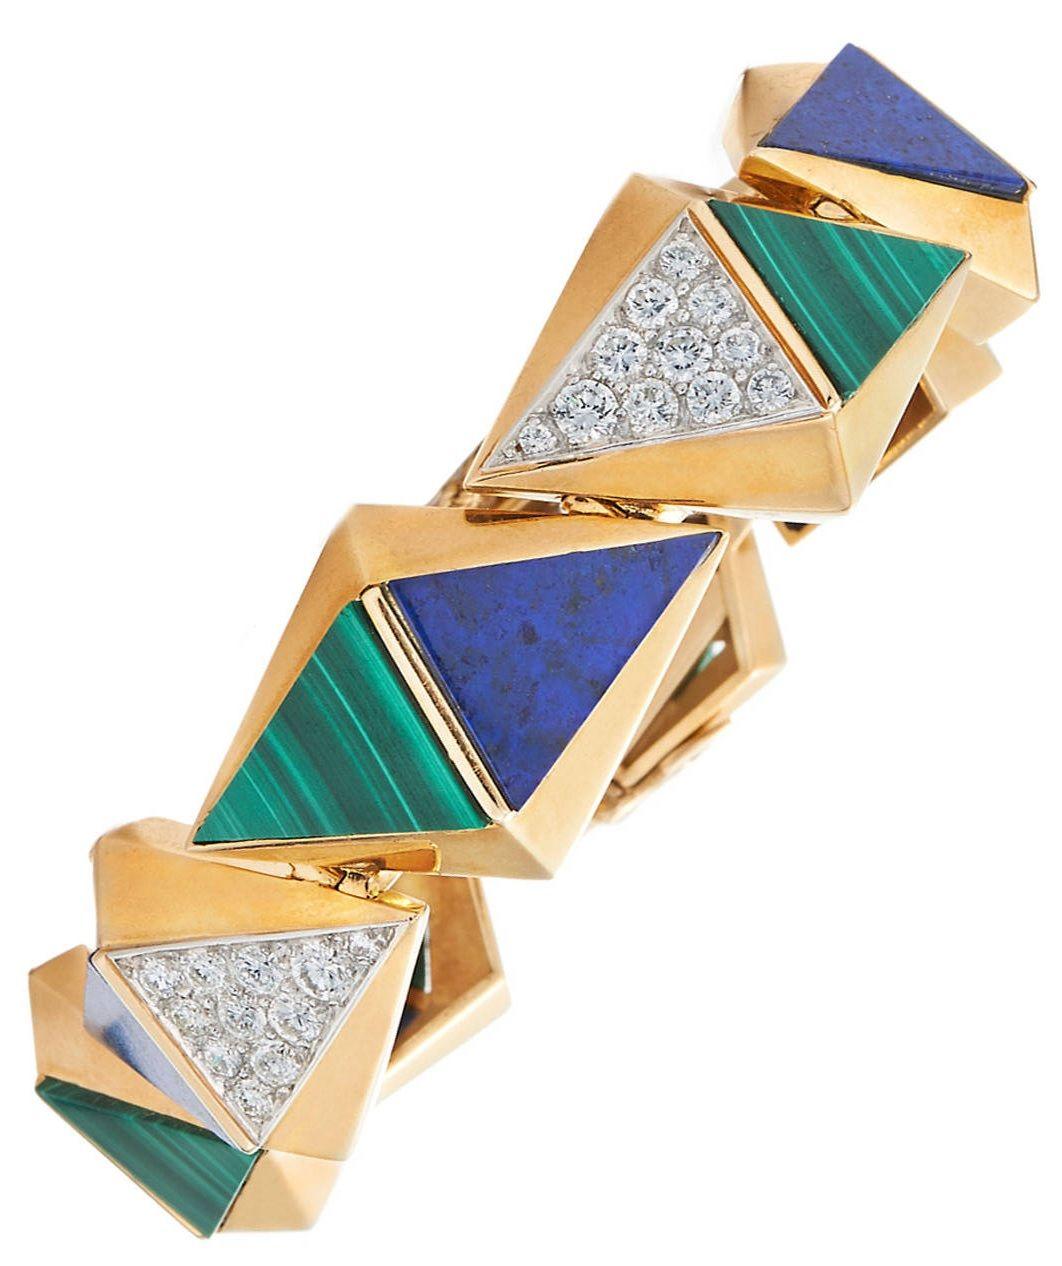 French 1970s Modernist Lapis Lazuli Malachite Diamond Gold